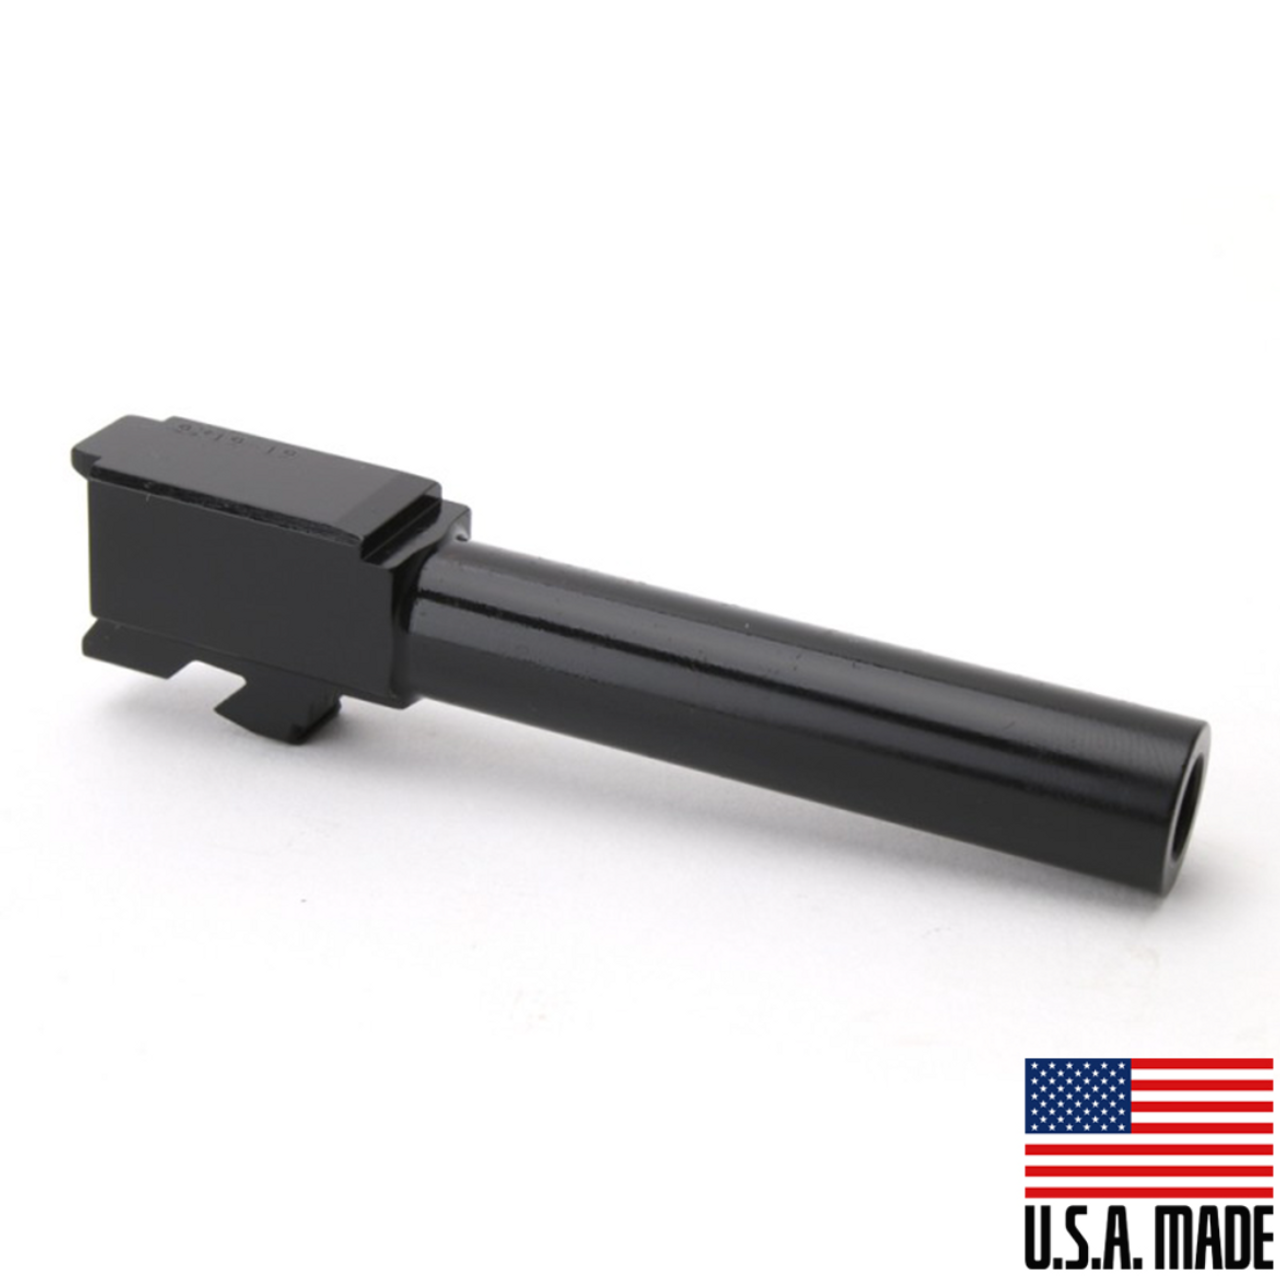 Glock 19 Black - Nitride 9mm Barrel (Made in USA)